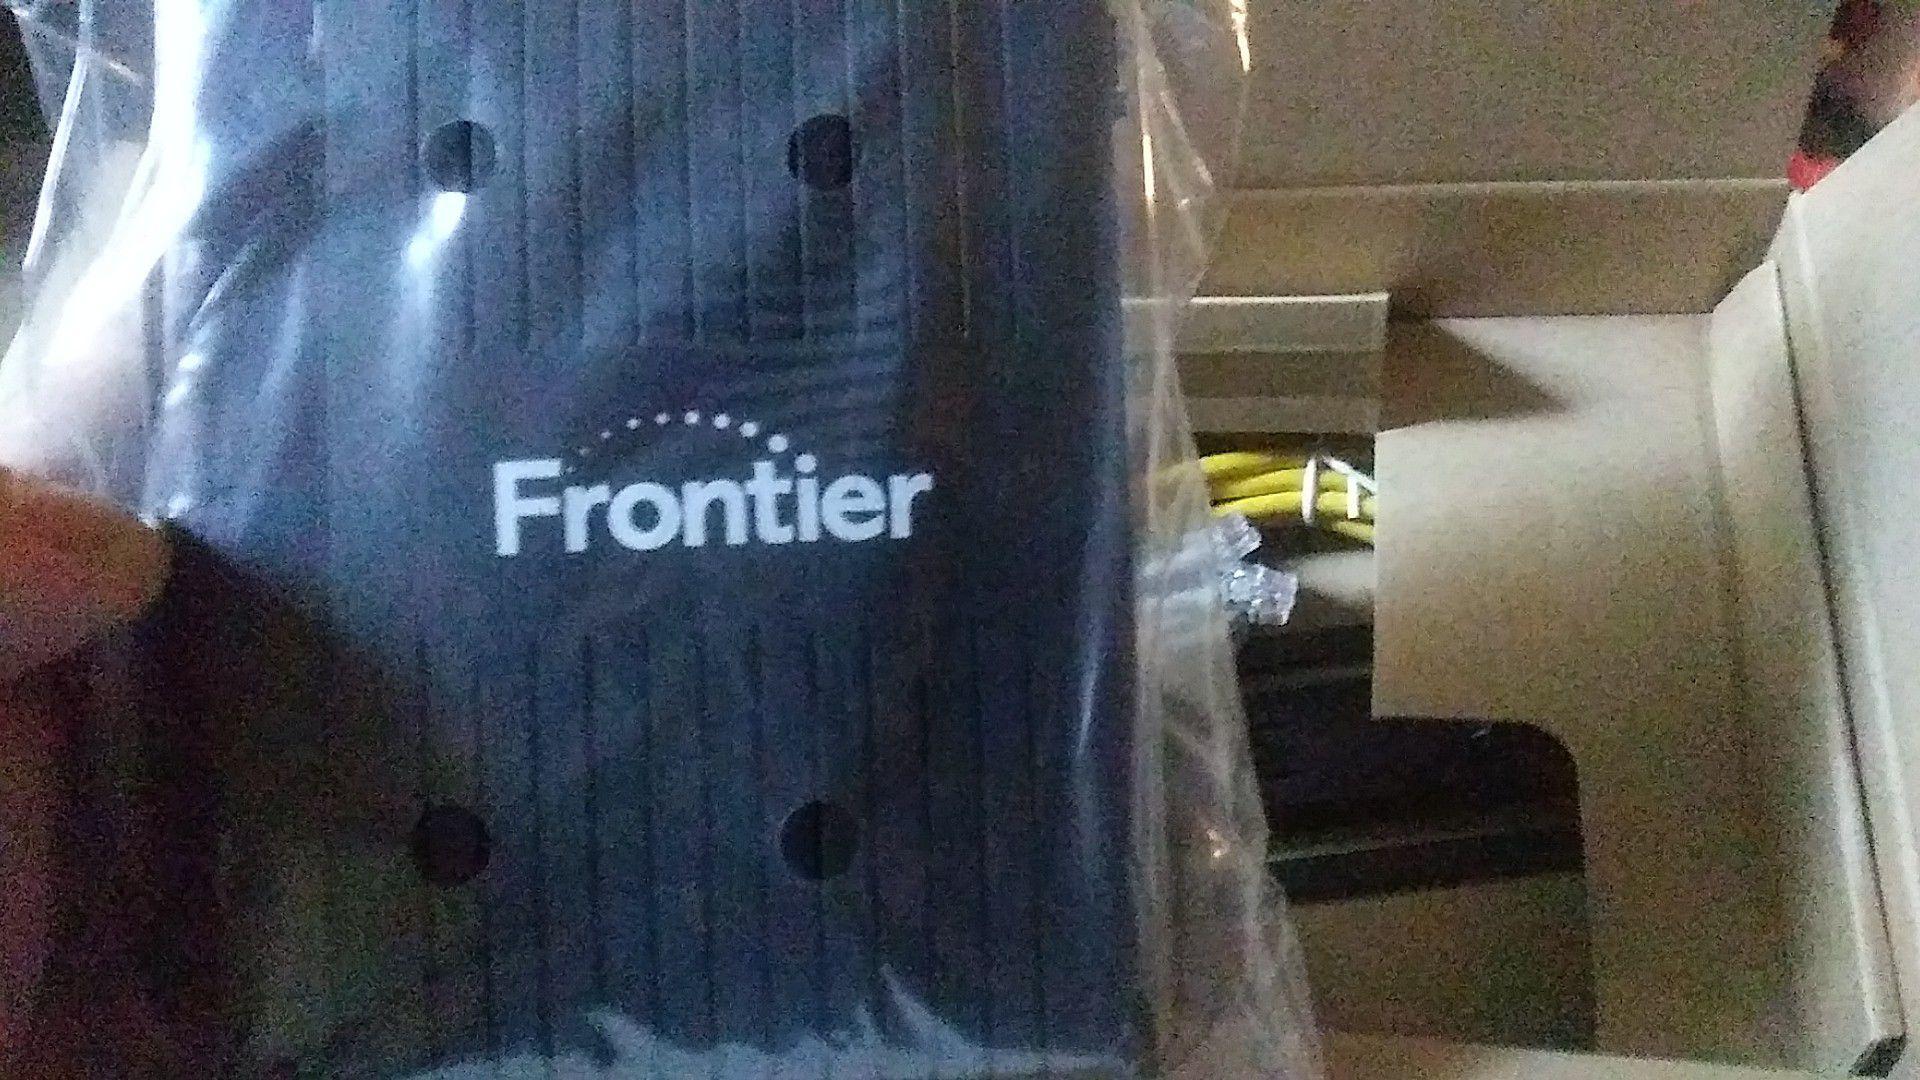 FRONTIER WIFI, DSL, PHONE ROUTER/MODEM